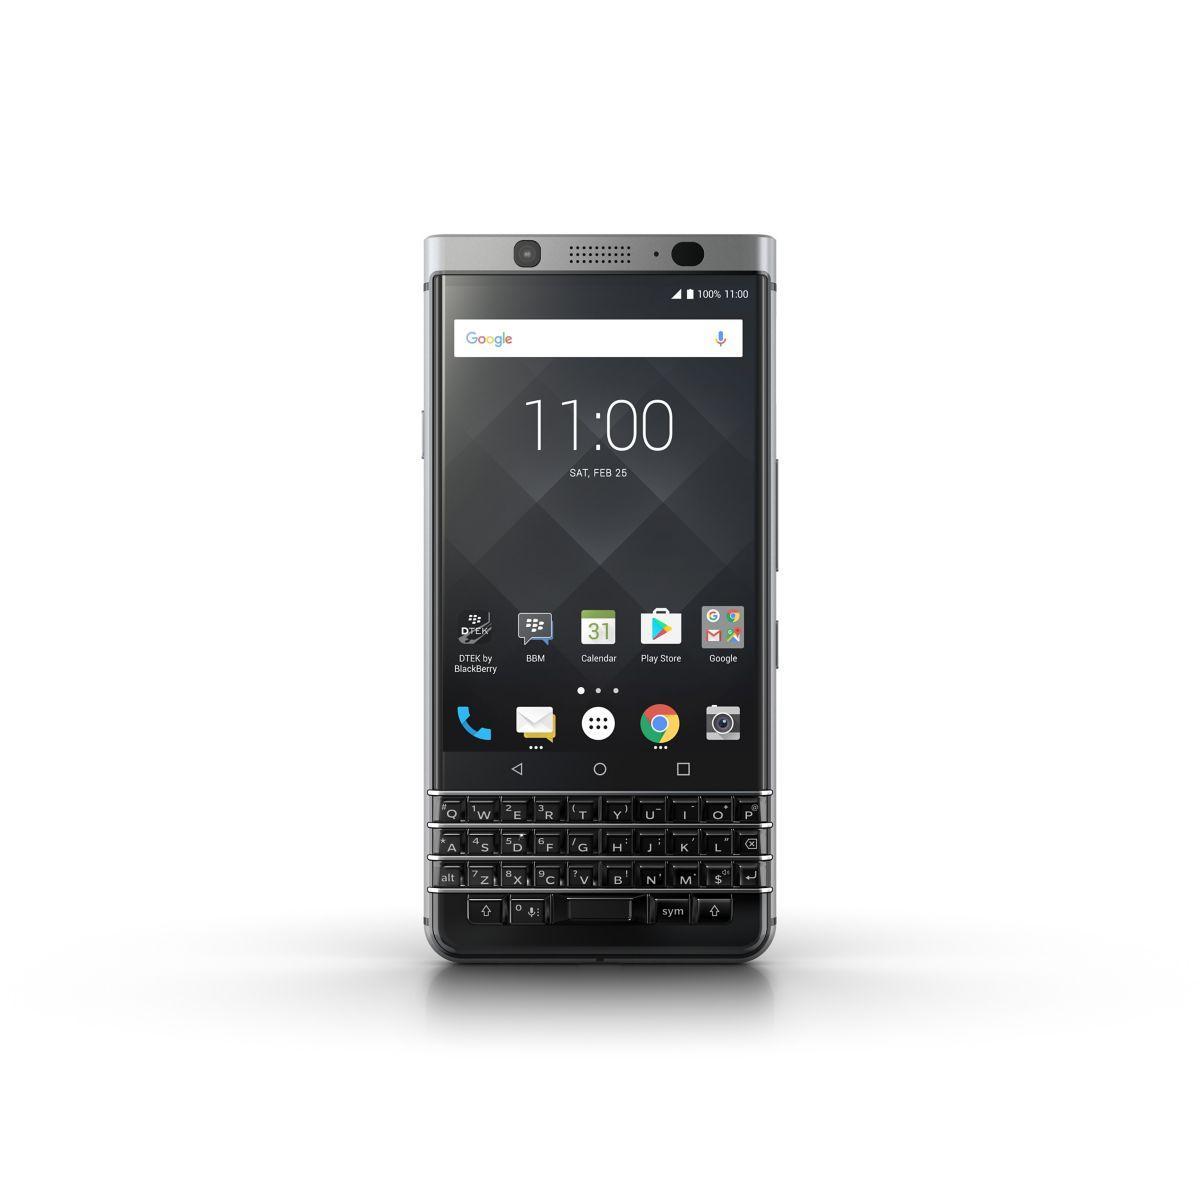 Smartphone blackberry keyone - 2% de remise immédiate avec le code : cool2